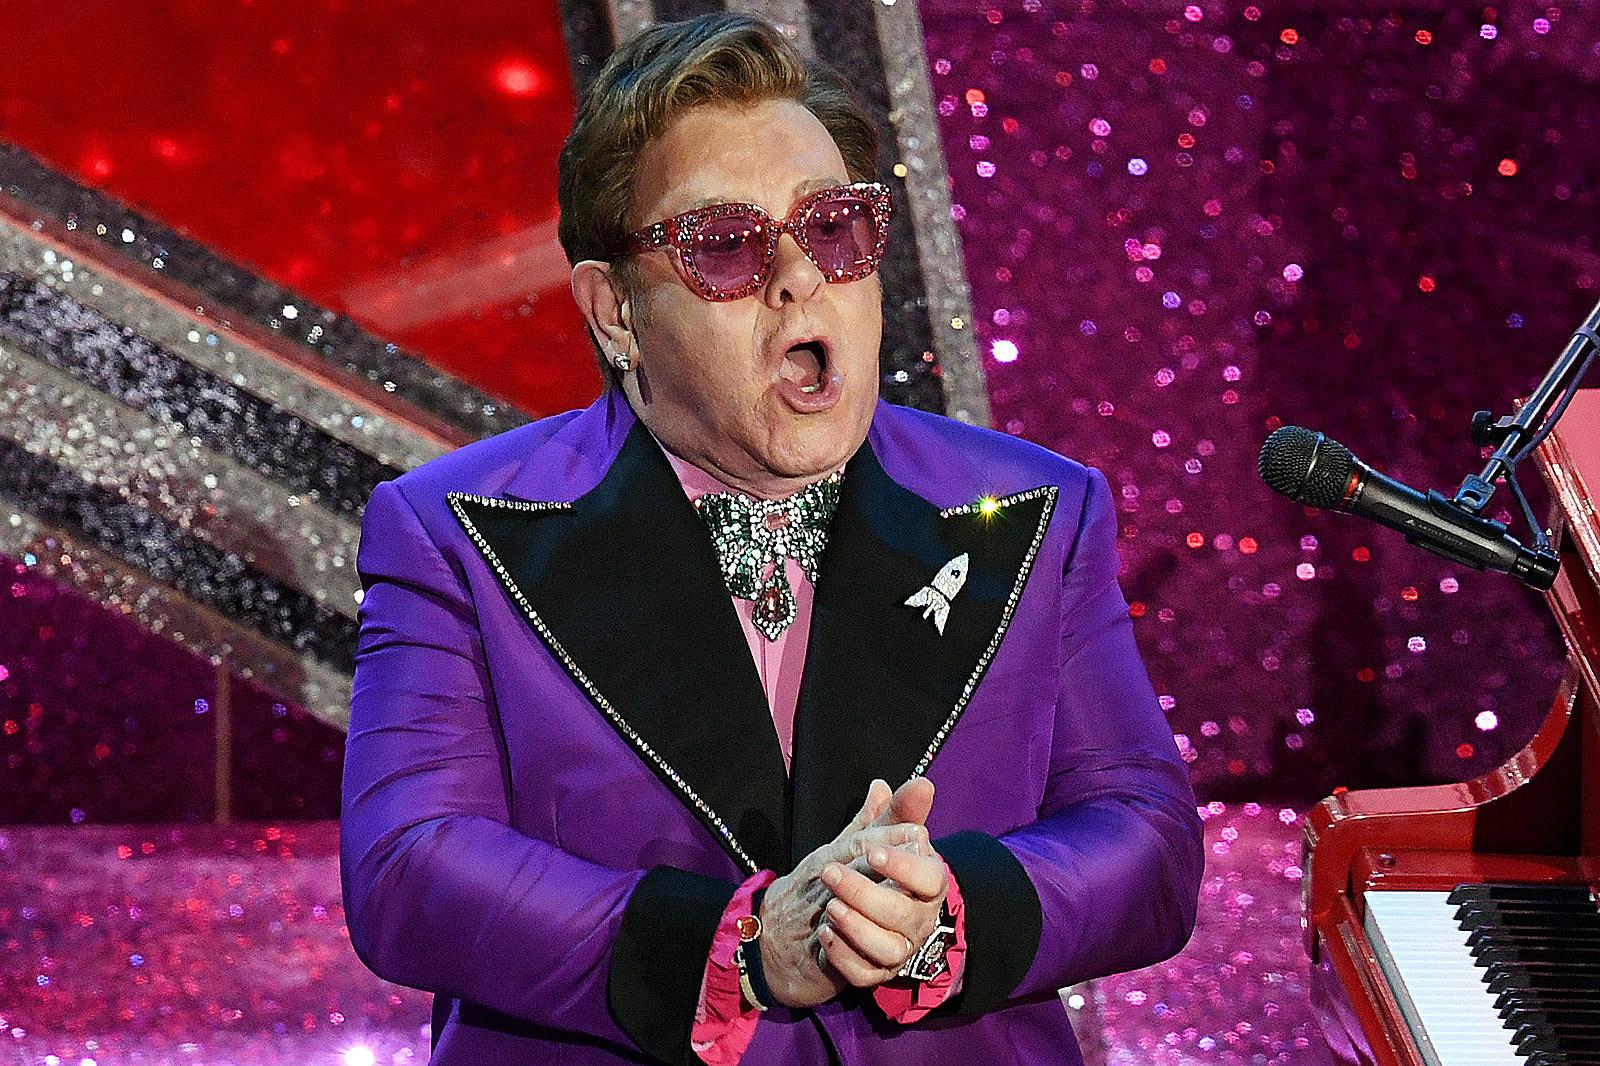 Elton John Says His Parents' Arguments Led to 'Big Spender' Habit